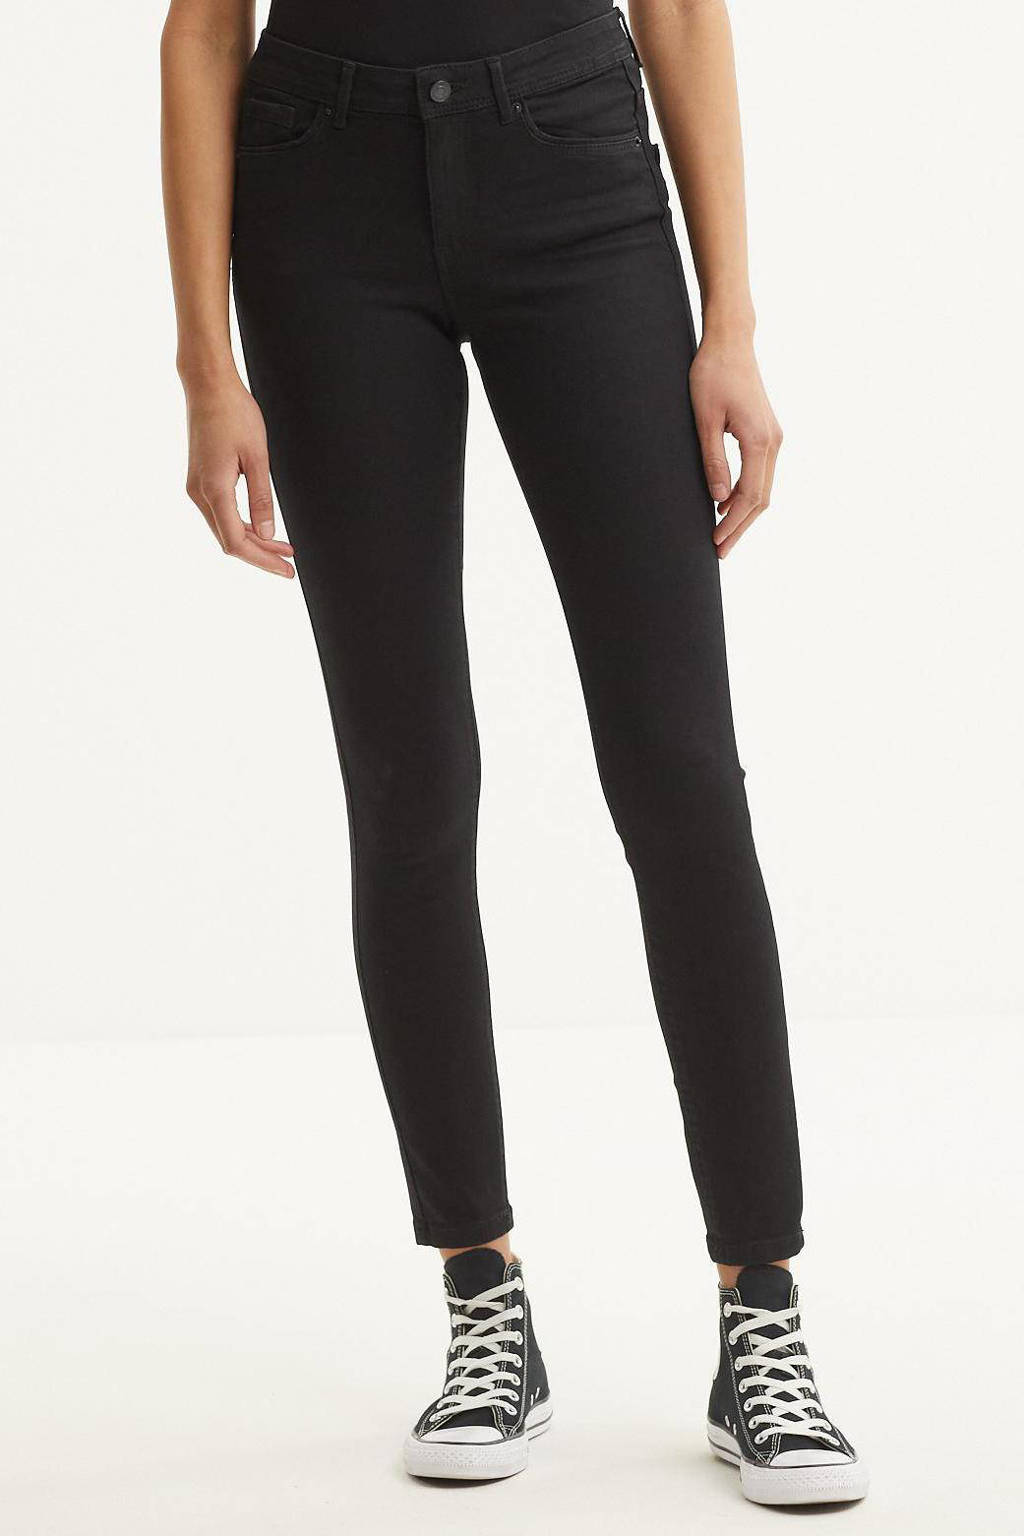 VERO MODA mid waist skinny jeans VMTANYA black, Zwart